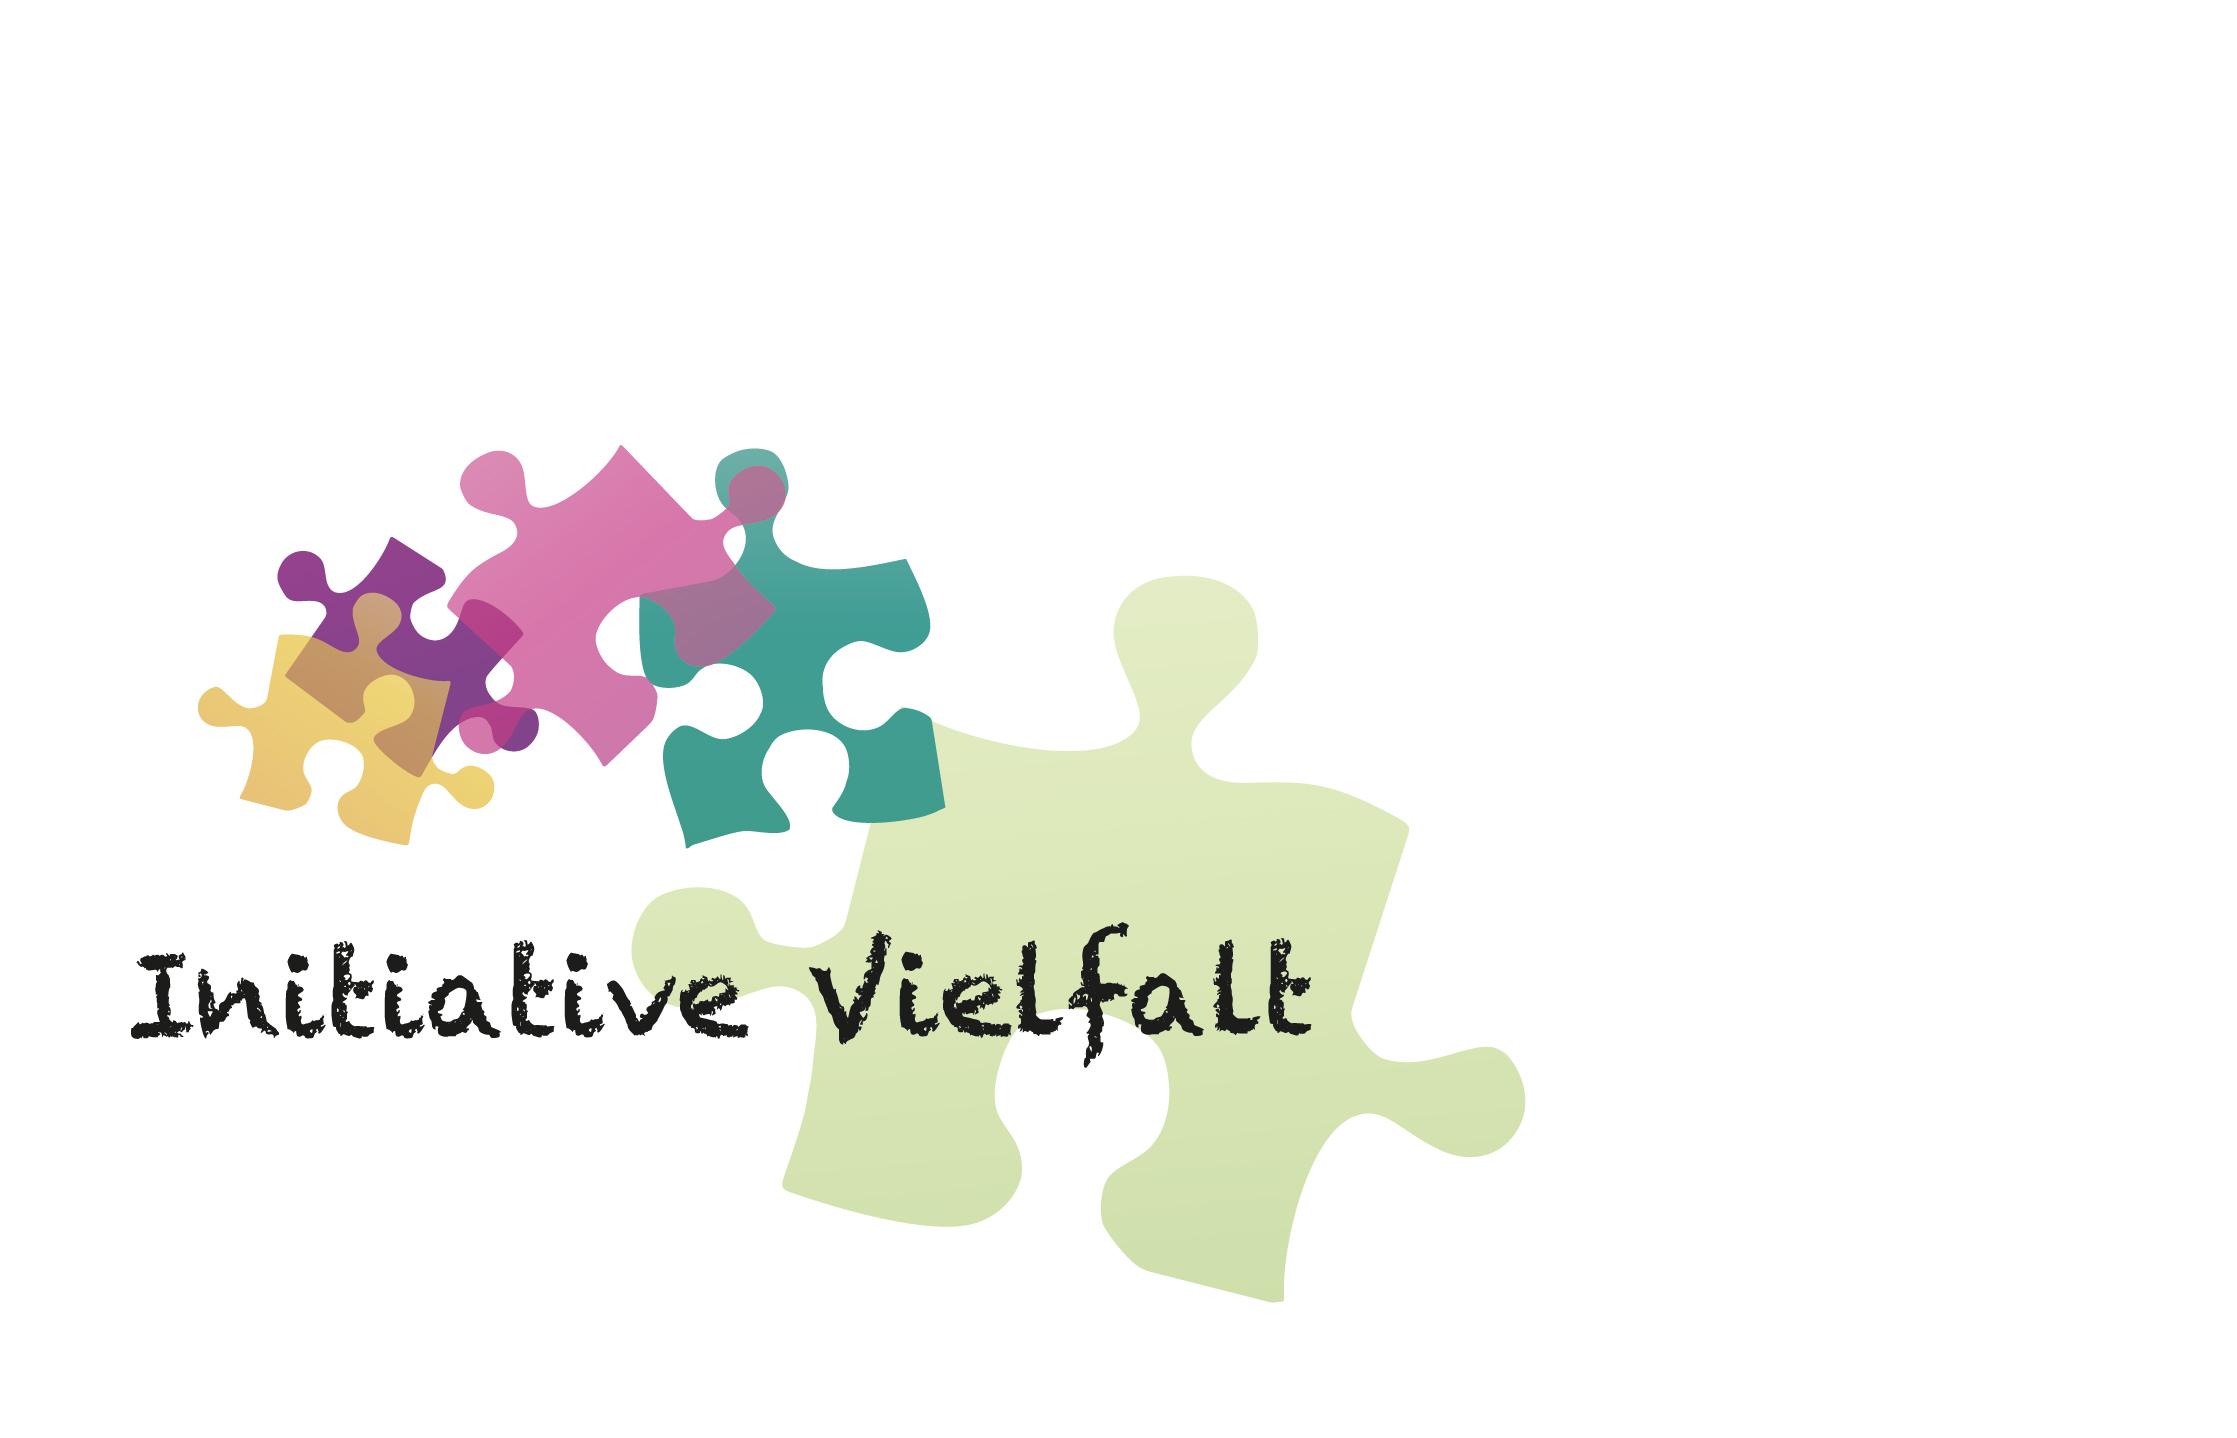 Initiative Vielfalt